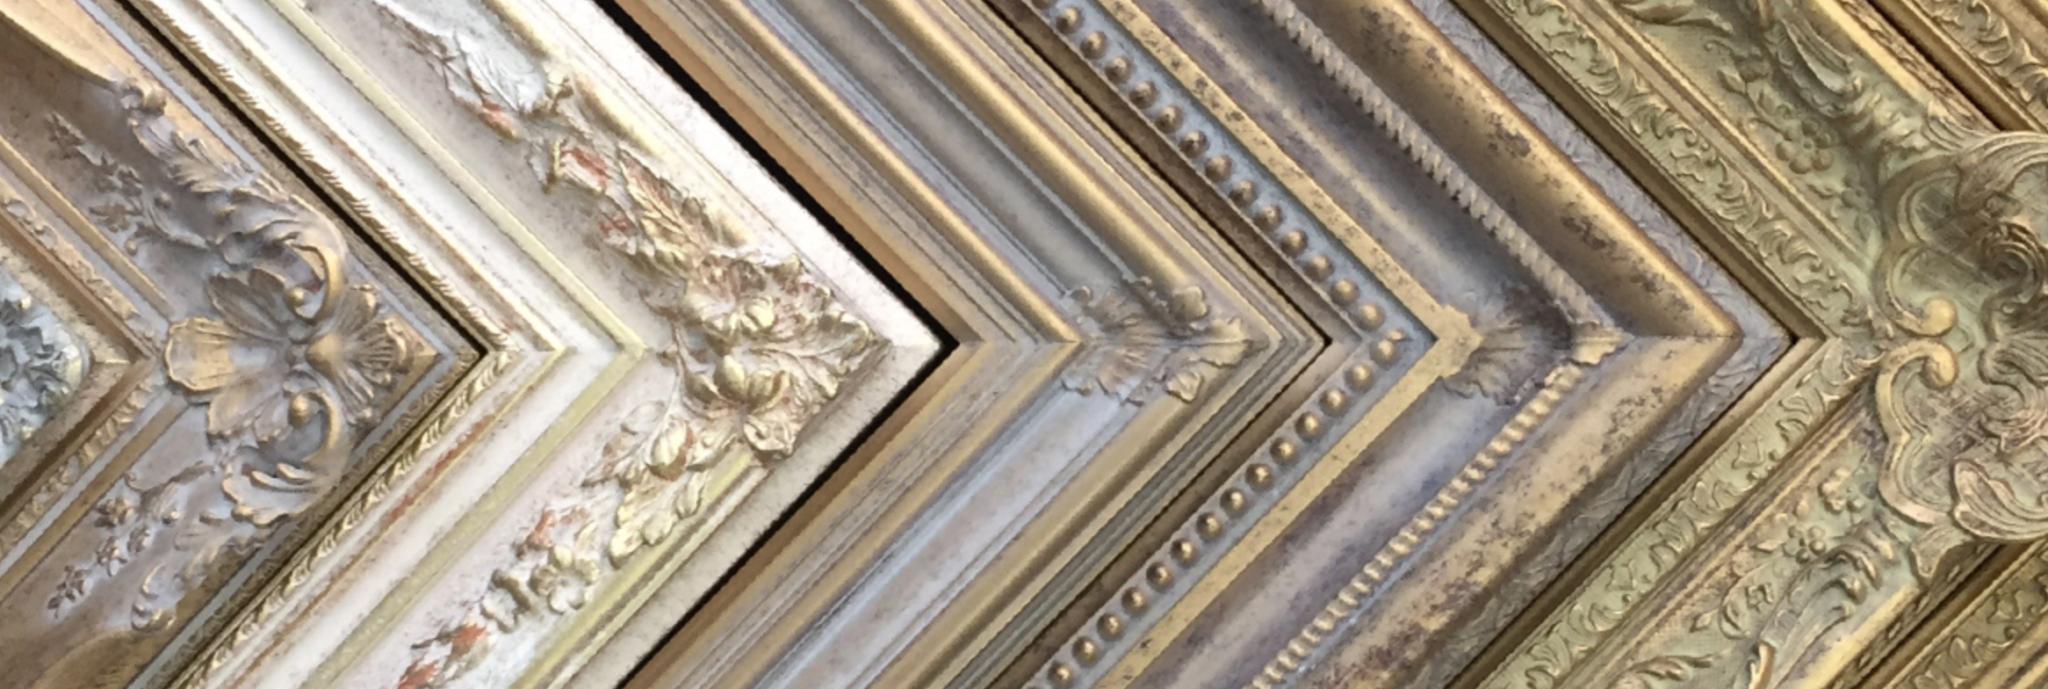 professional-fine-art-frames Best Art Frame Molding Info @capturingmomentsphotography.net